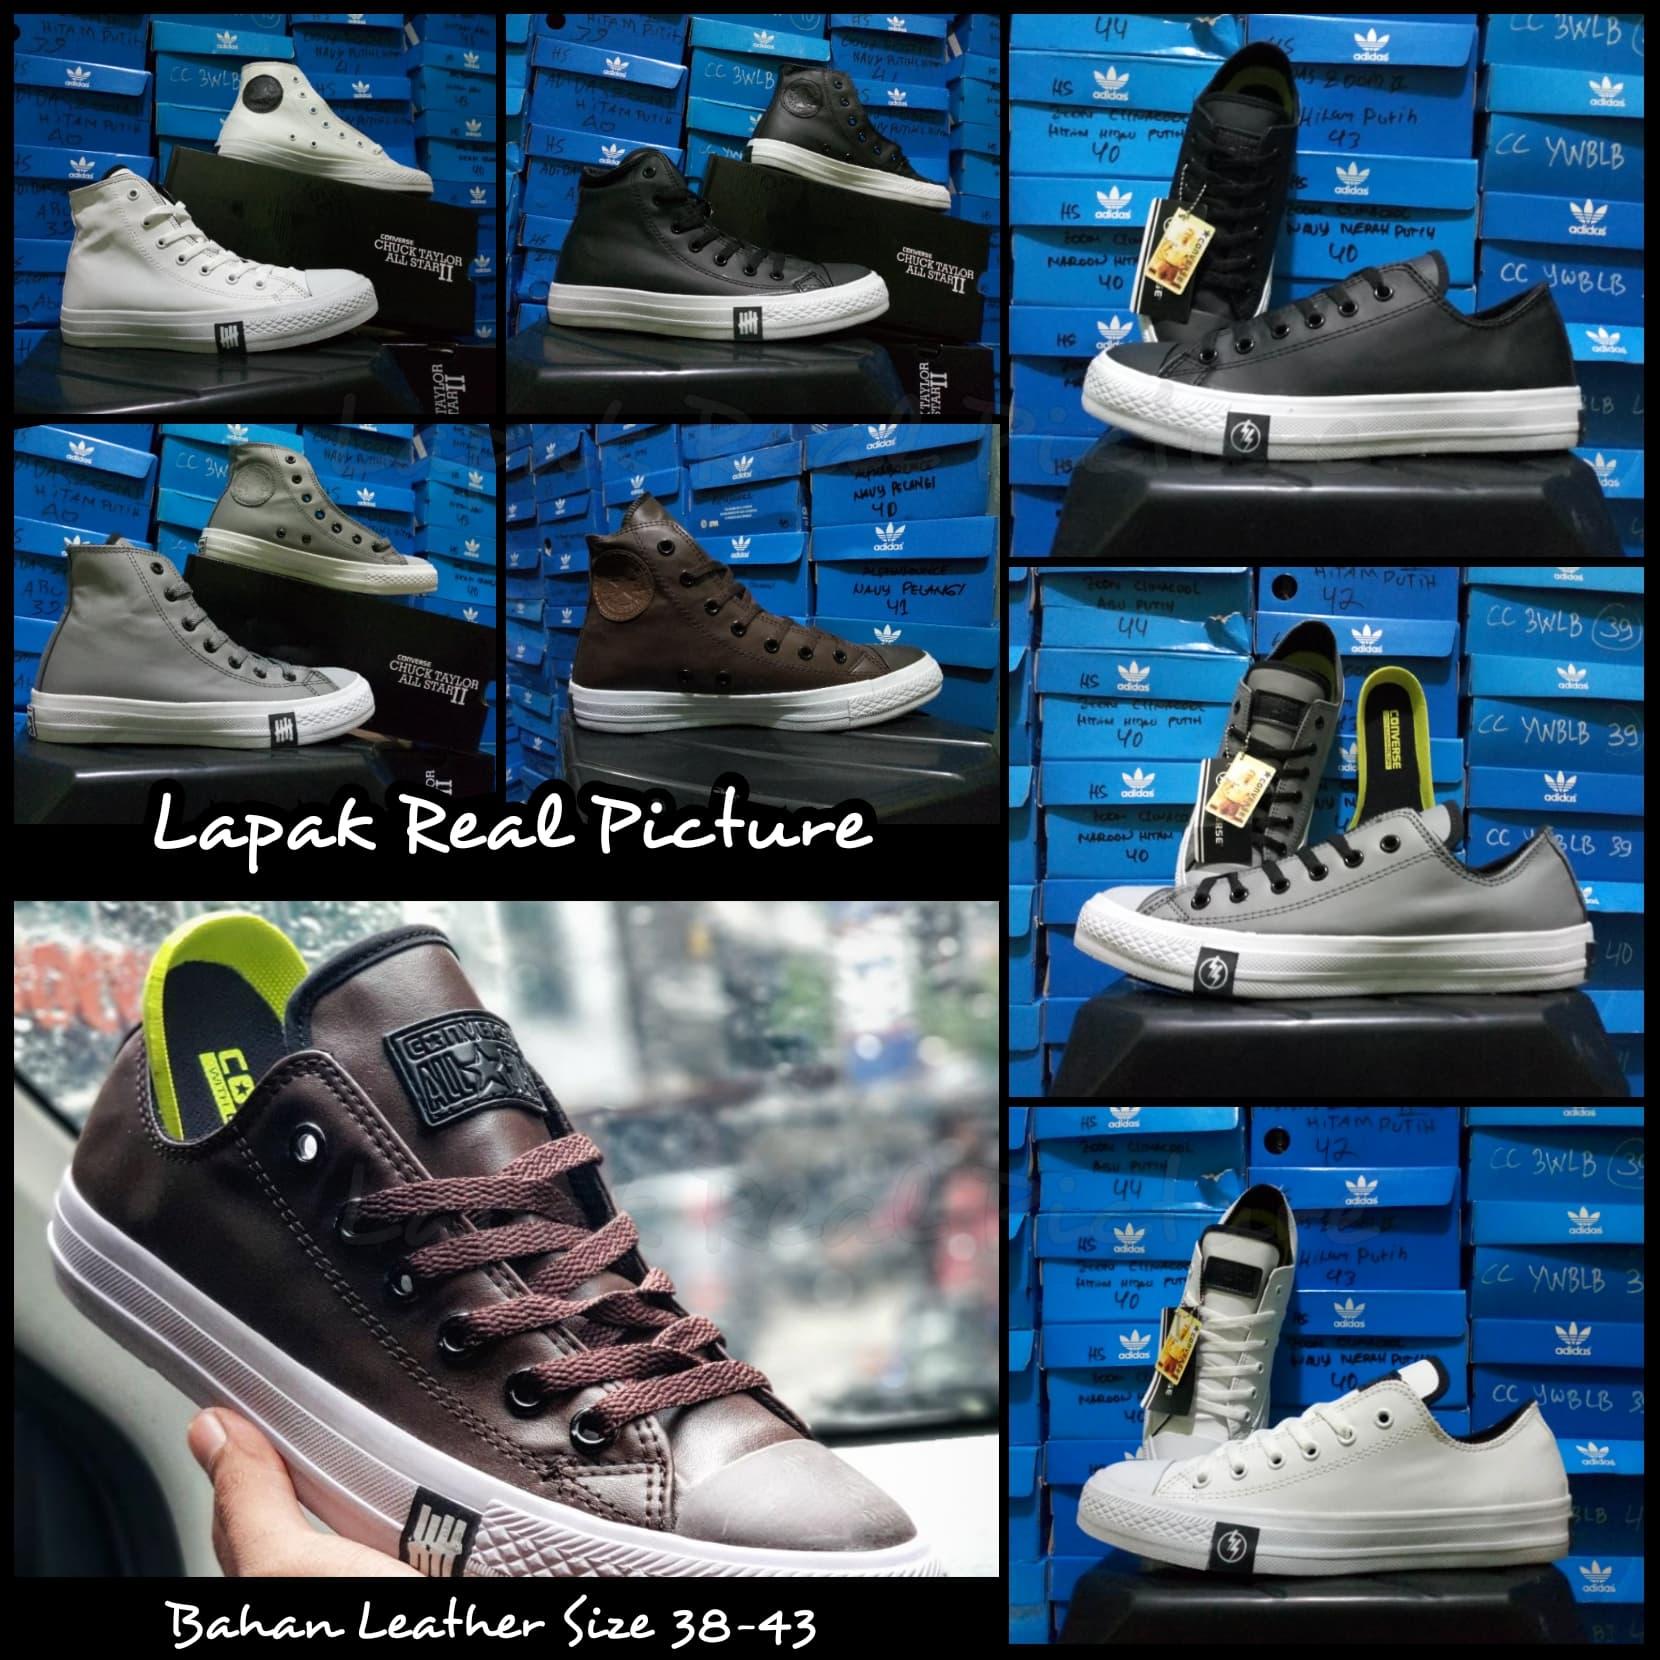 sepatu pria wanita converse allstar ct2 classic pendek kulit leather 7f20ad7dd3